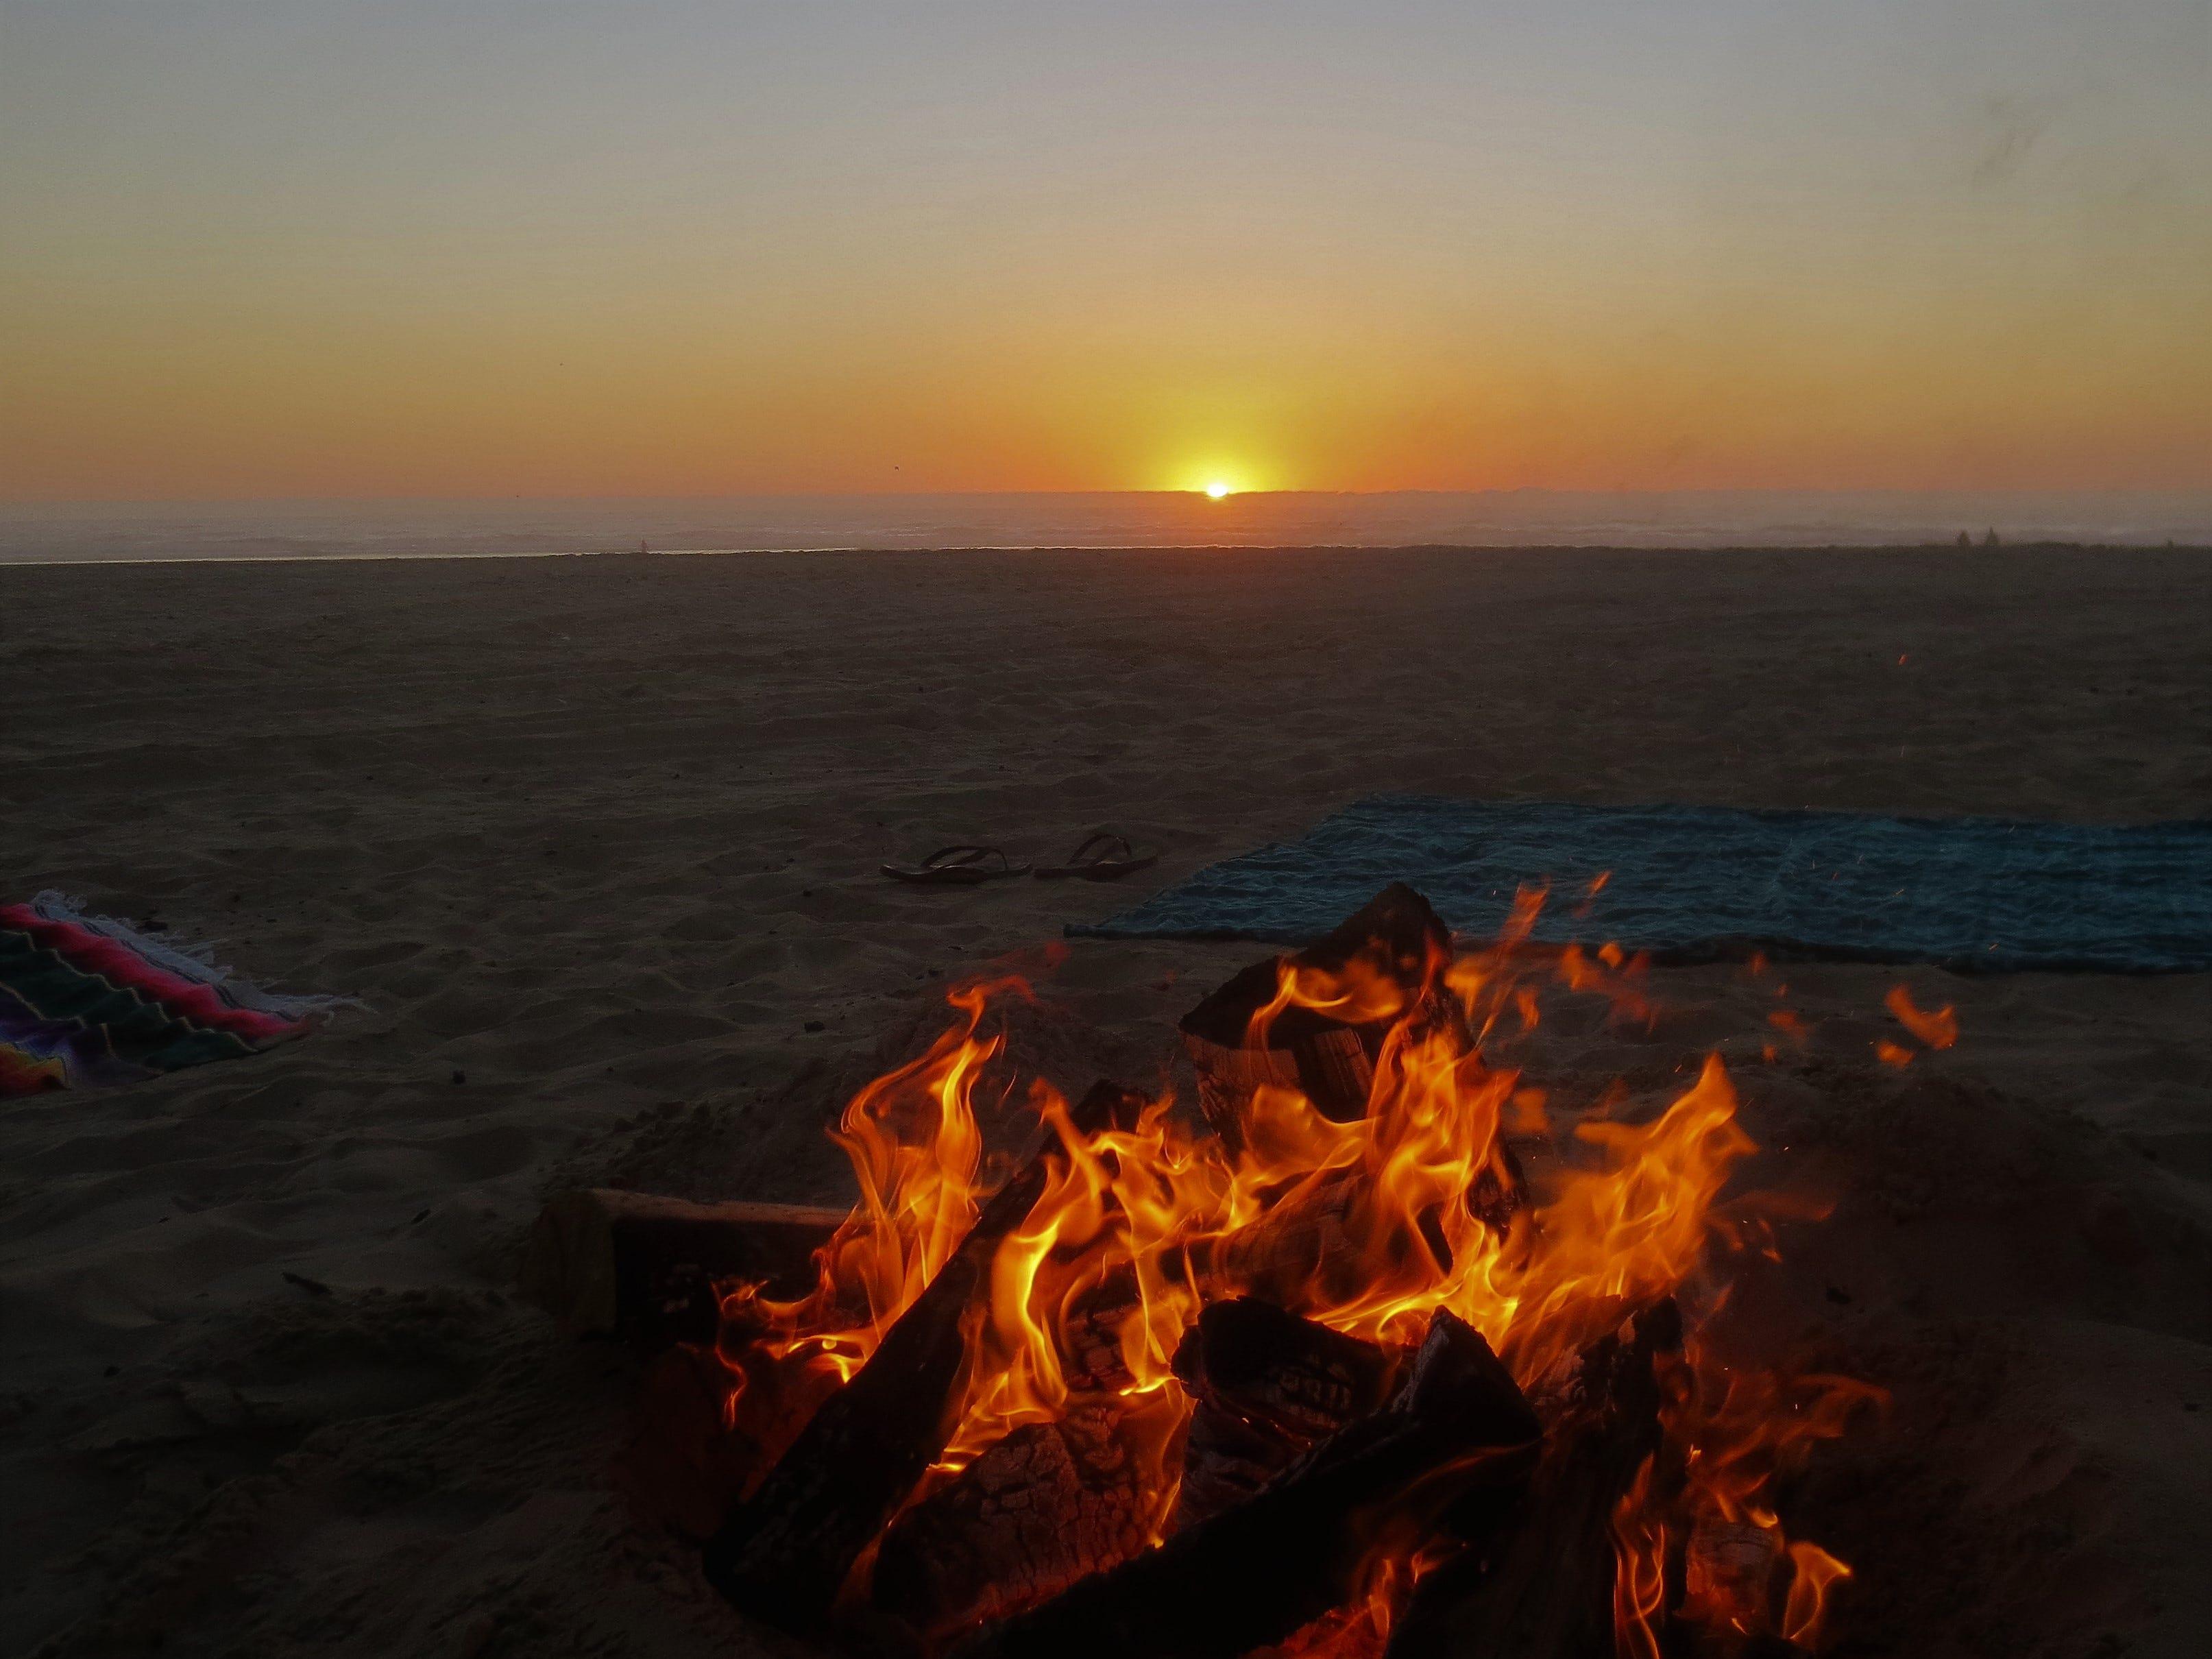 A sunset bonfire at Grover Beach in San Luis Obispo County, California.